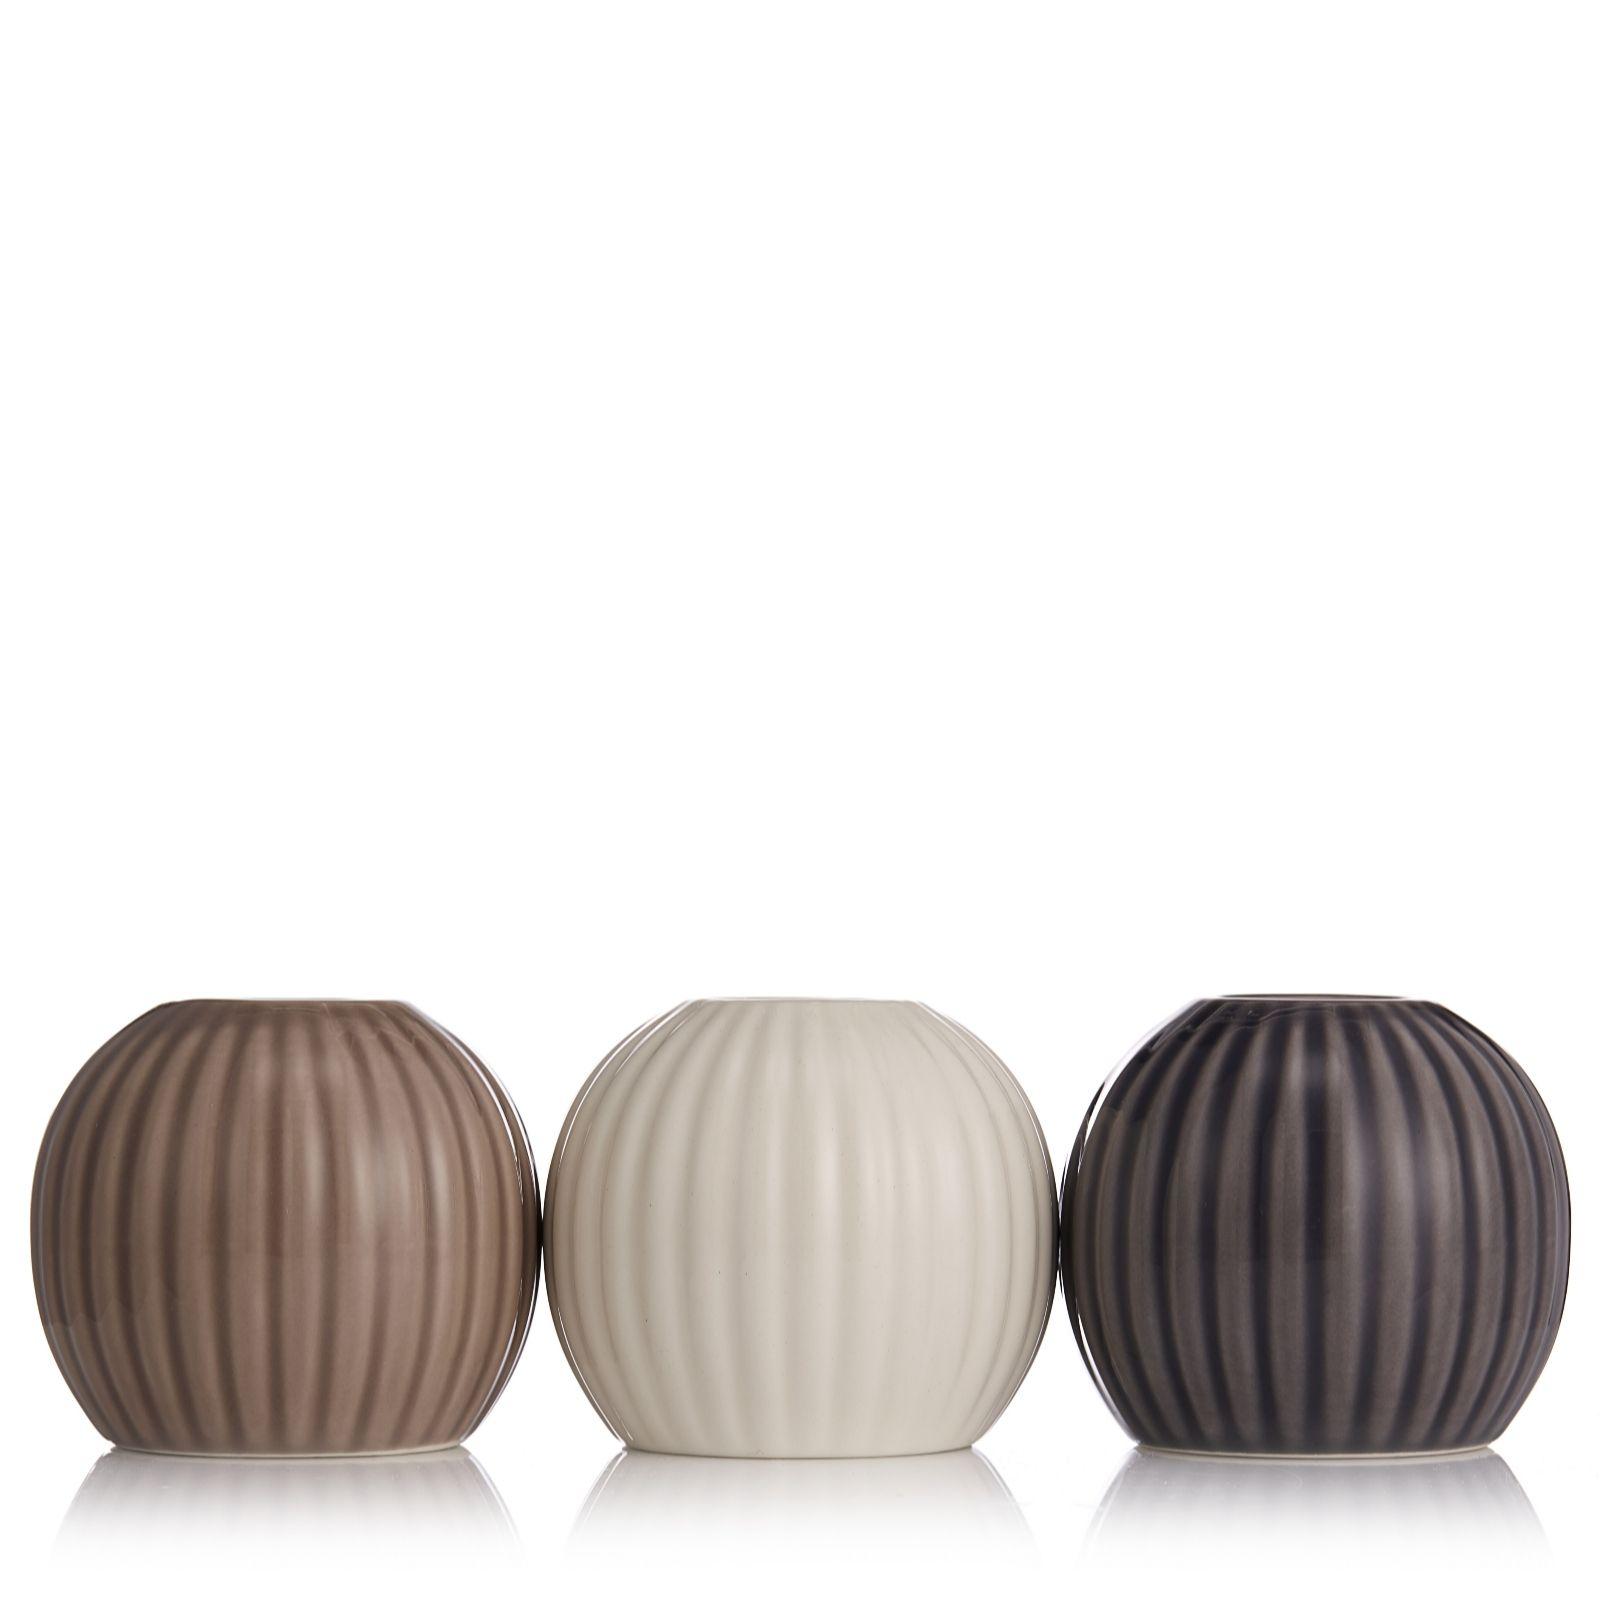 K by kelly hoppen vases home kitchen qvc uk k by kelly hoppen set of 3 bud holder vases 708131 reviewsmspy